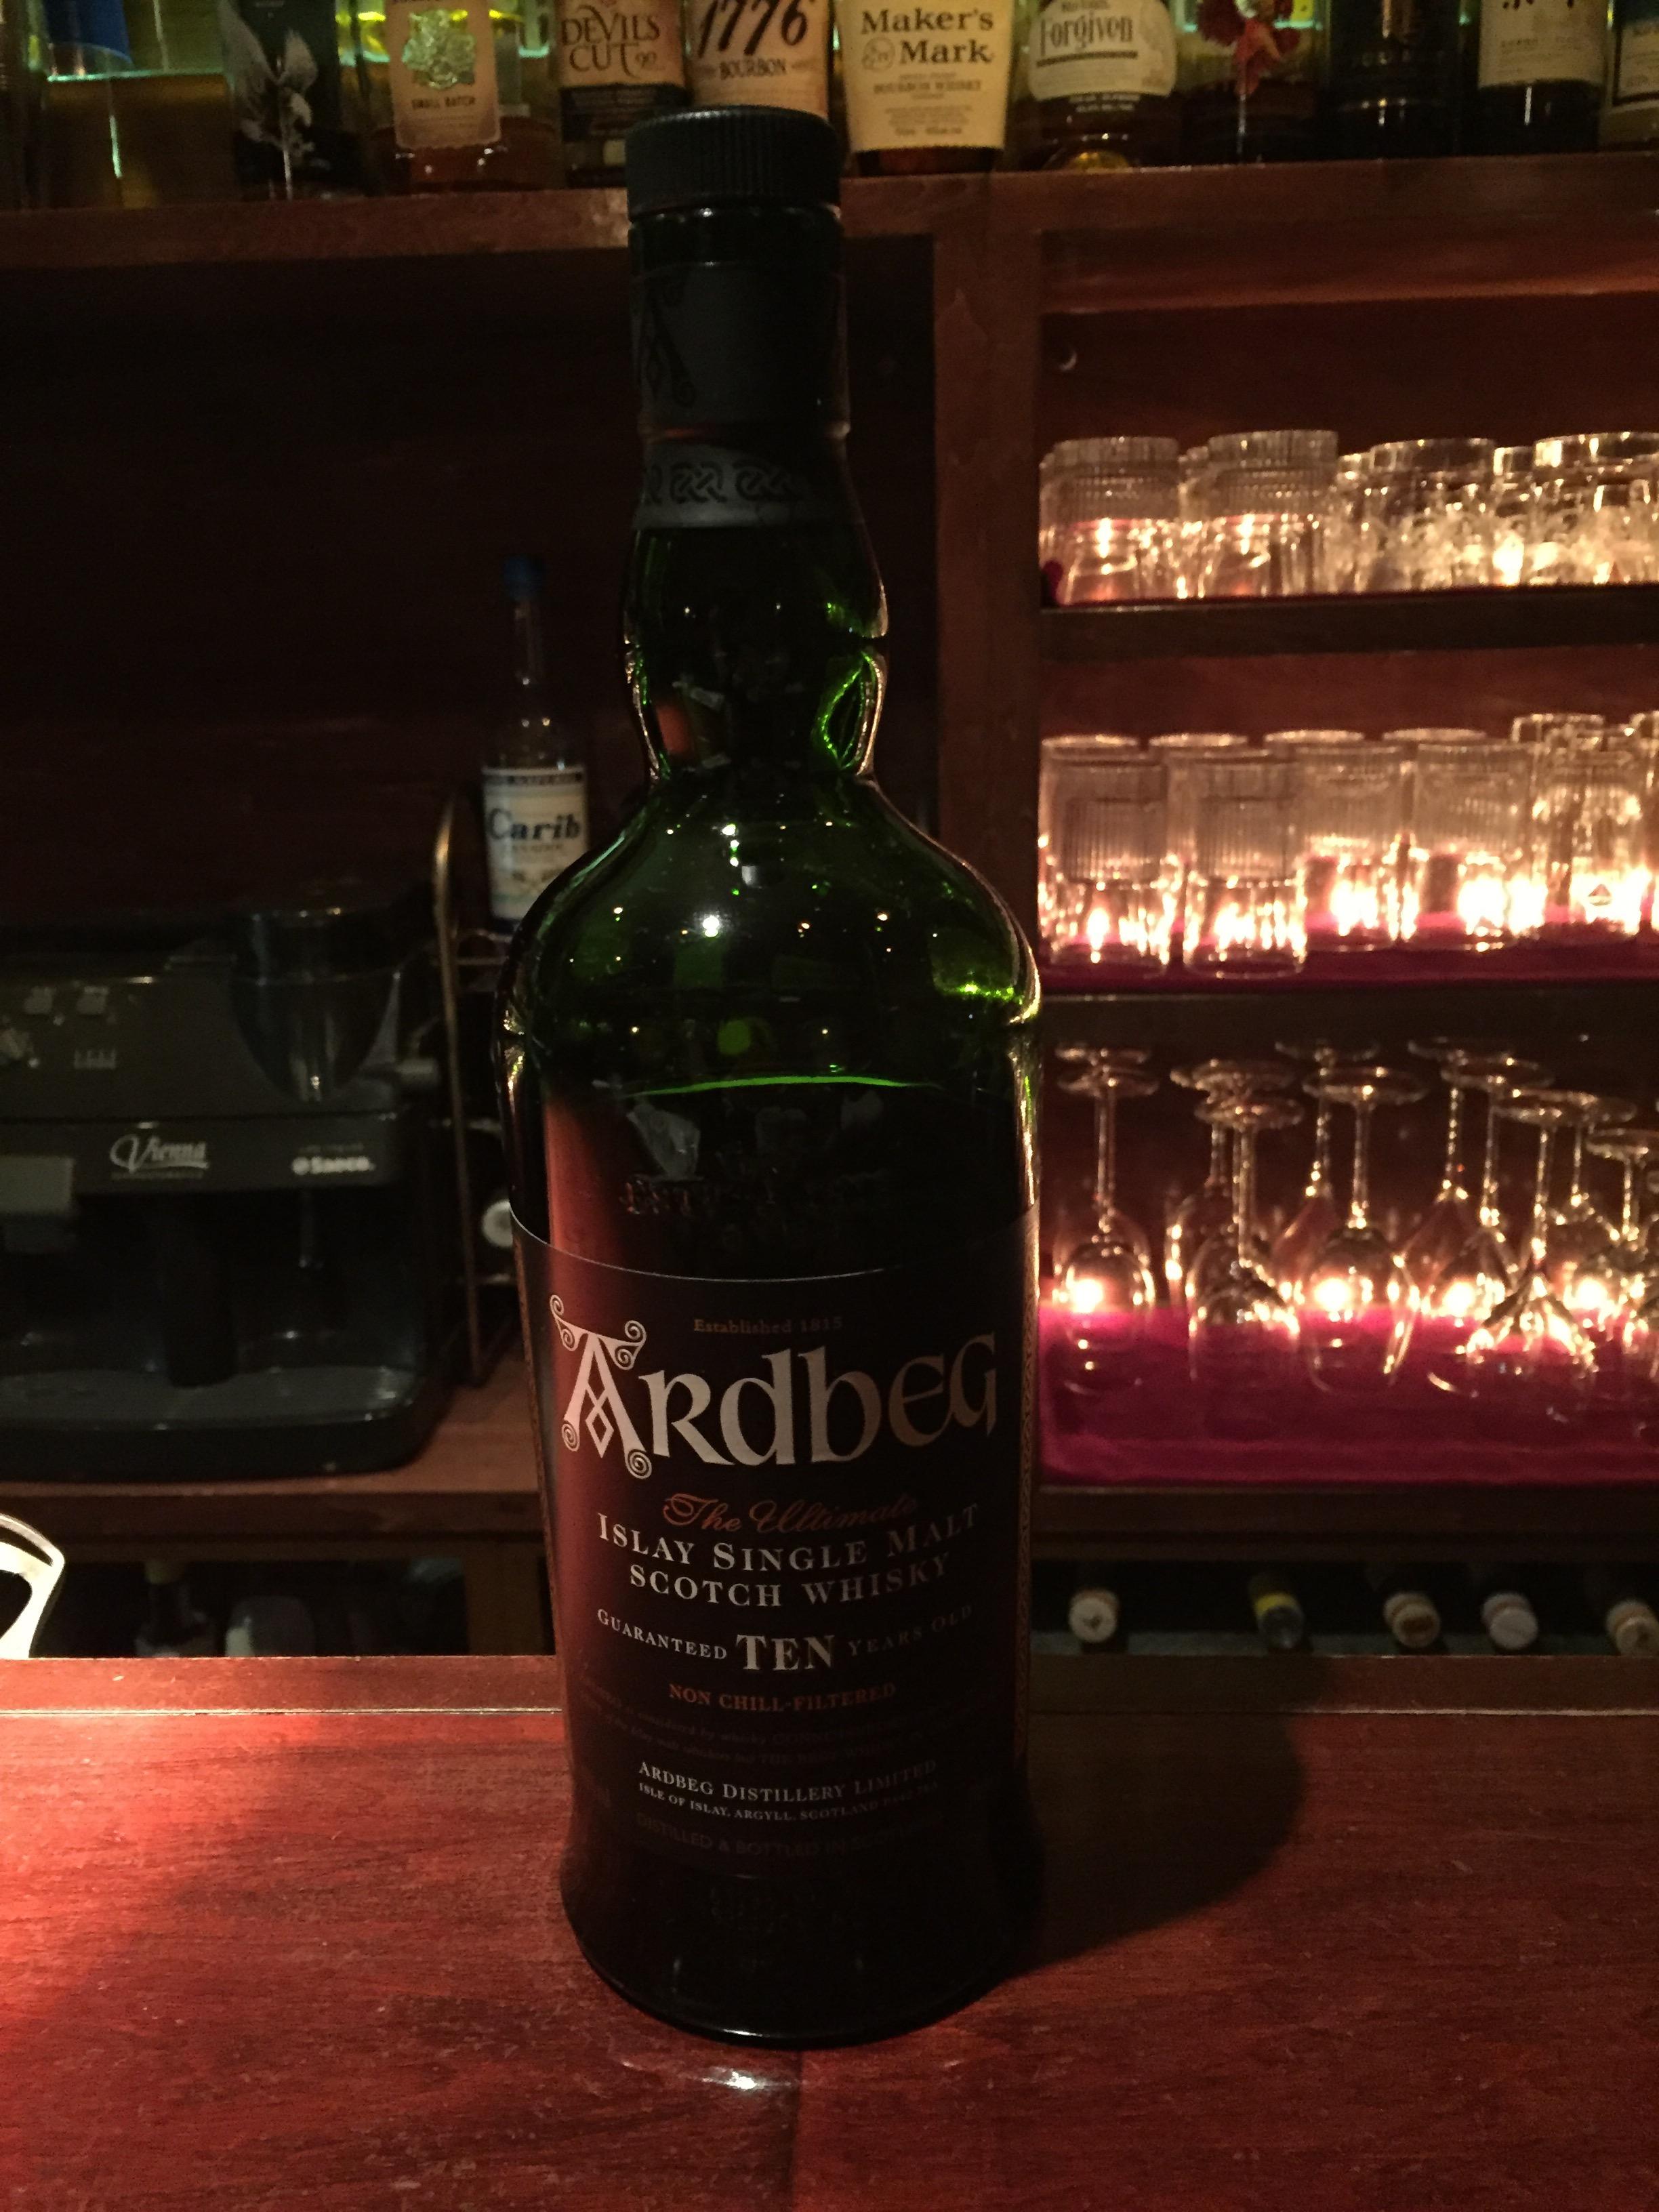 酒List ARdbeG